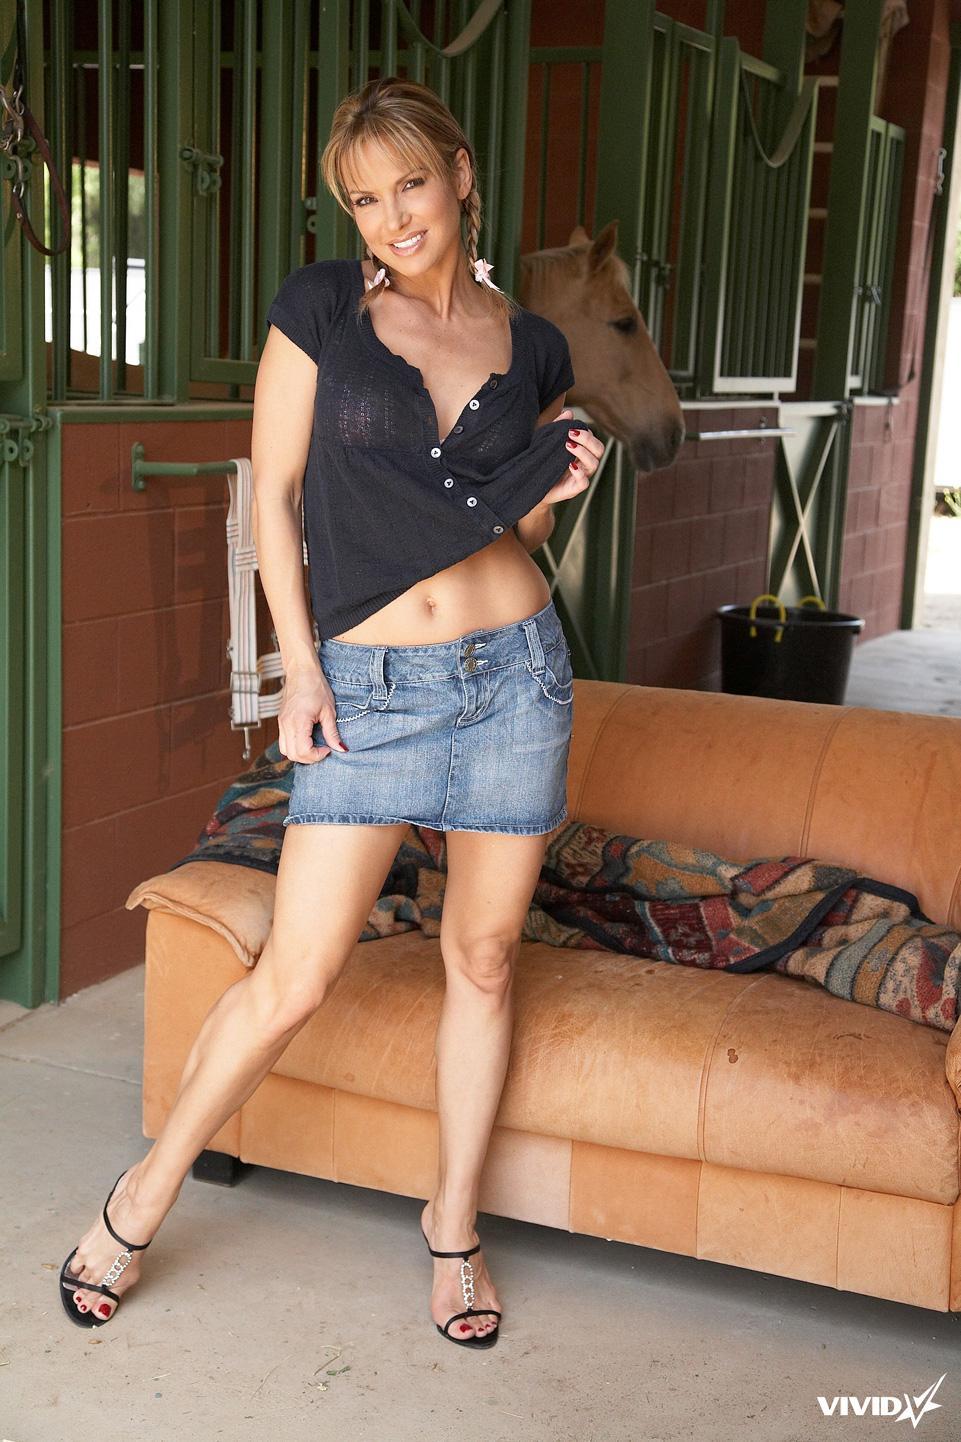 Sexy MILF with nice body - Allie Foster - 1